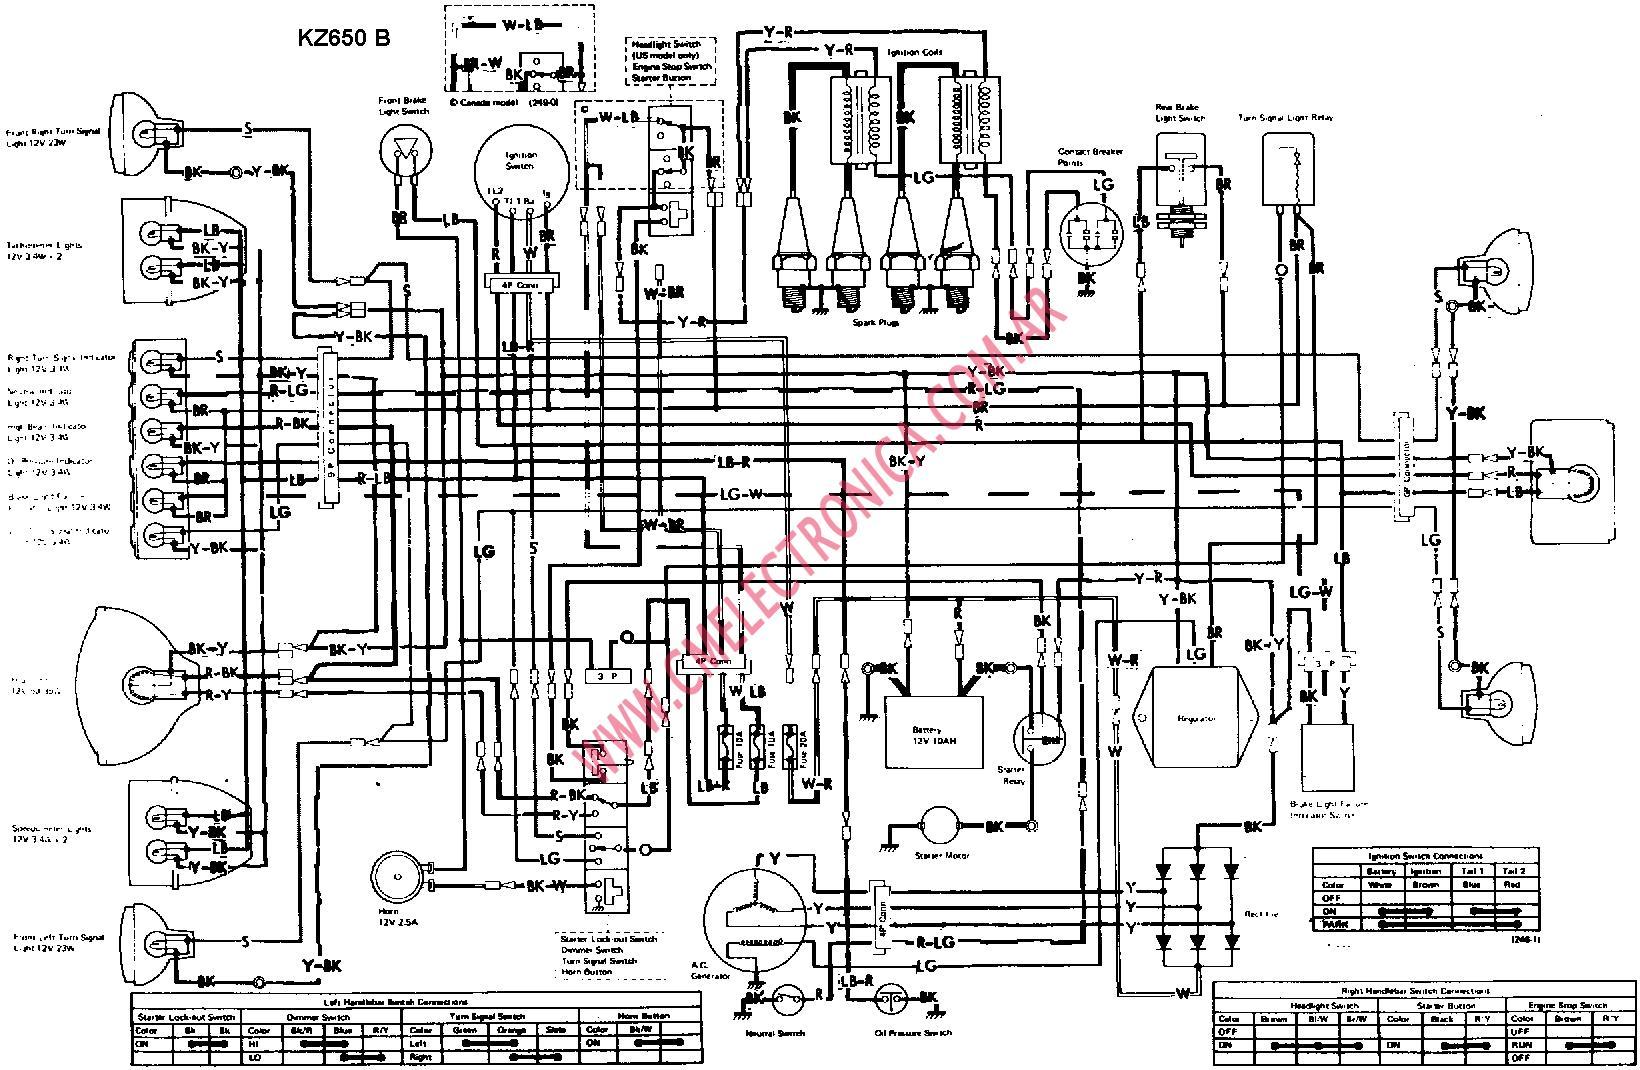 Kz550 Ltd Wiring Diagram